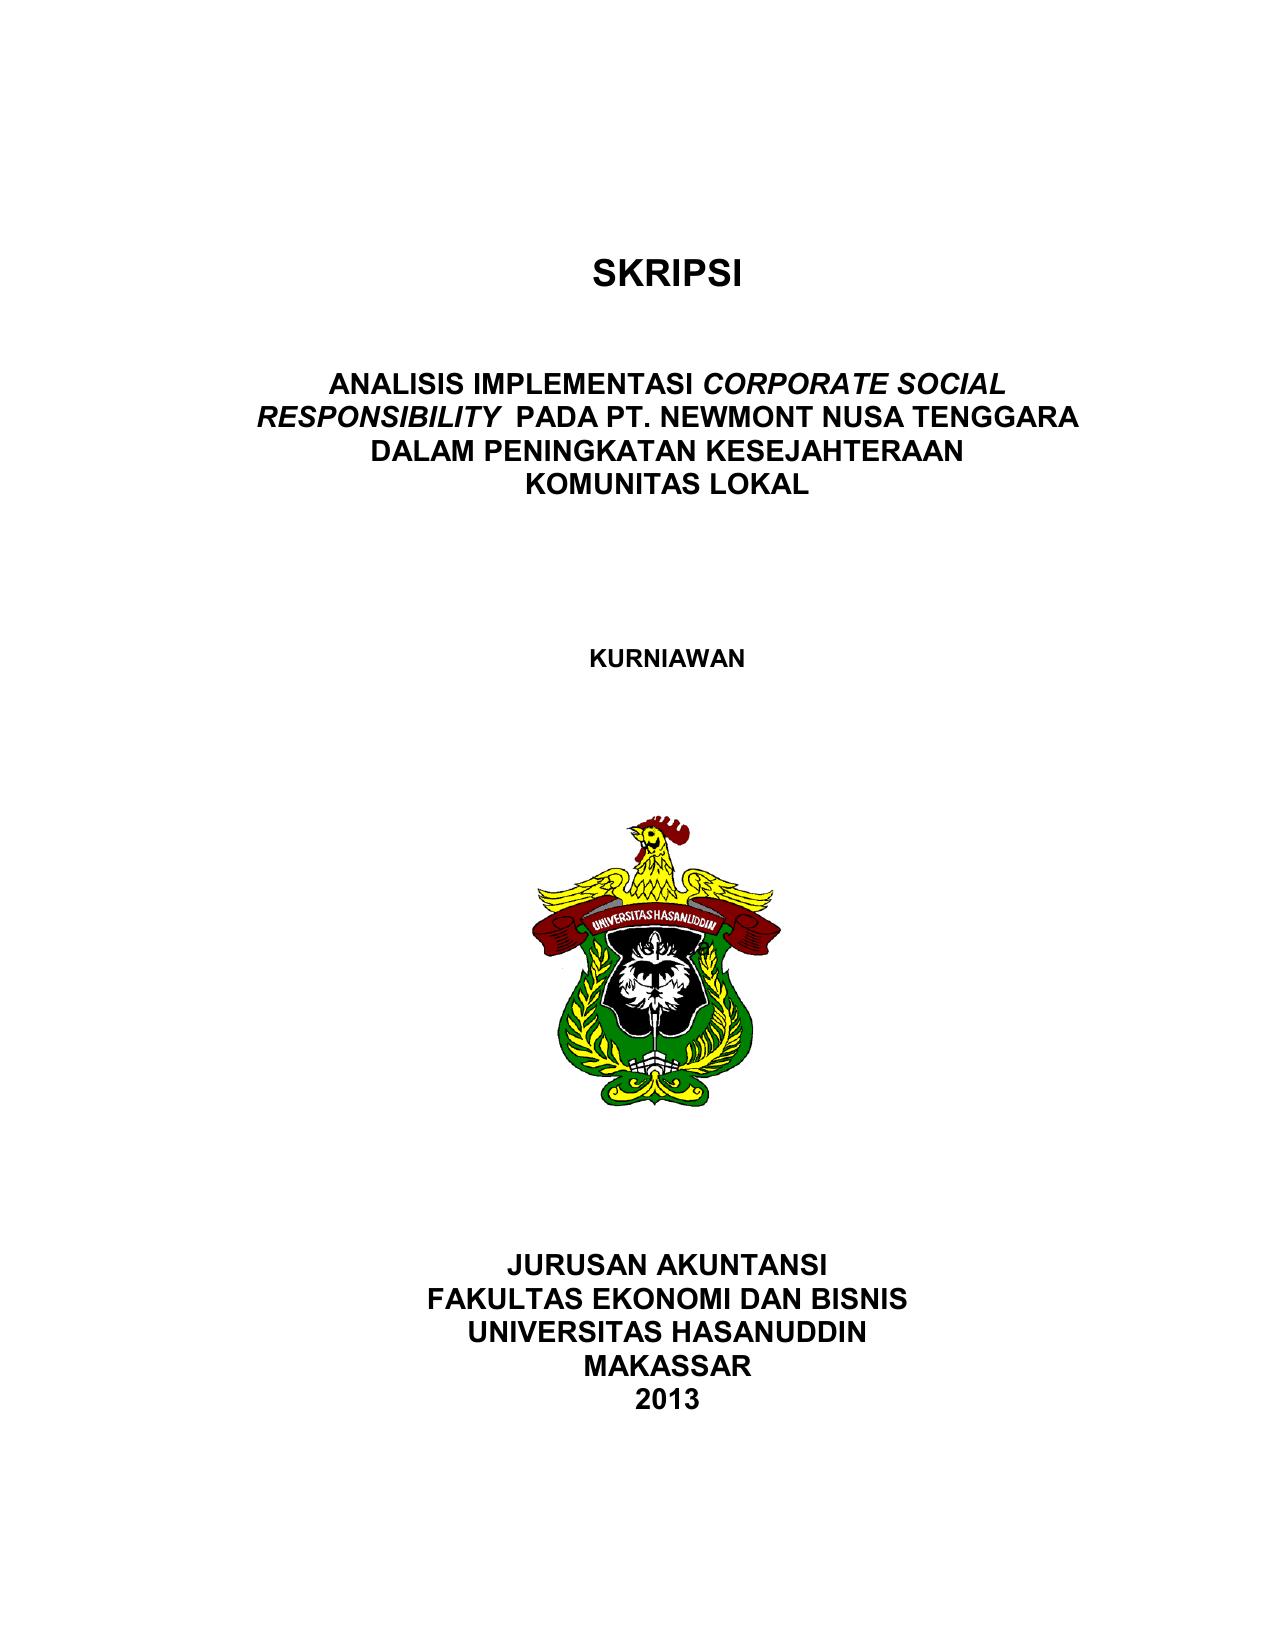 Skripsi Unhas Repository System